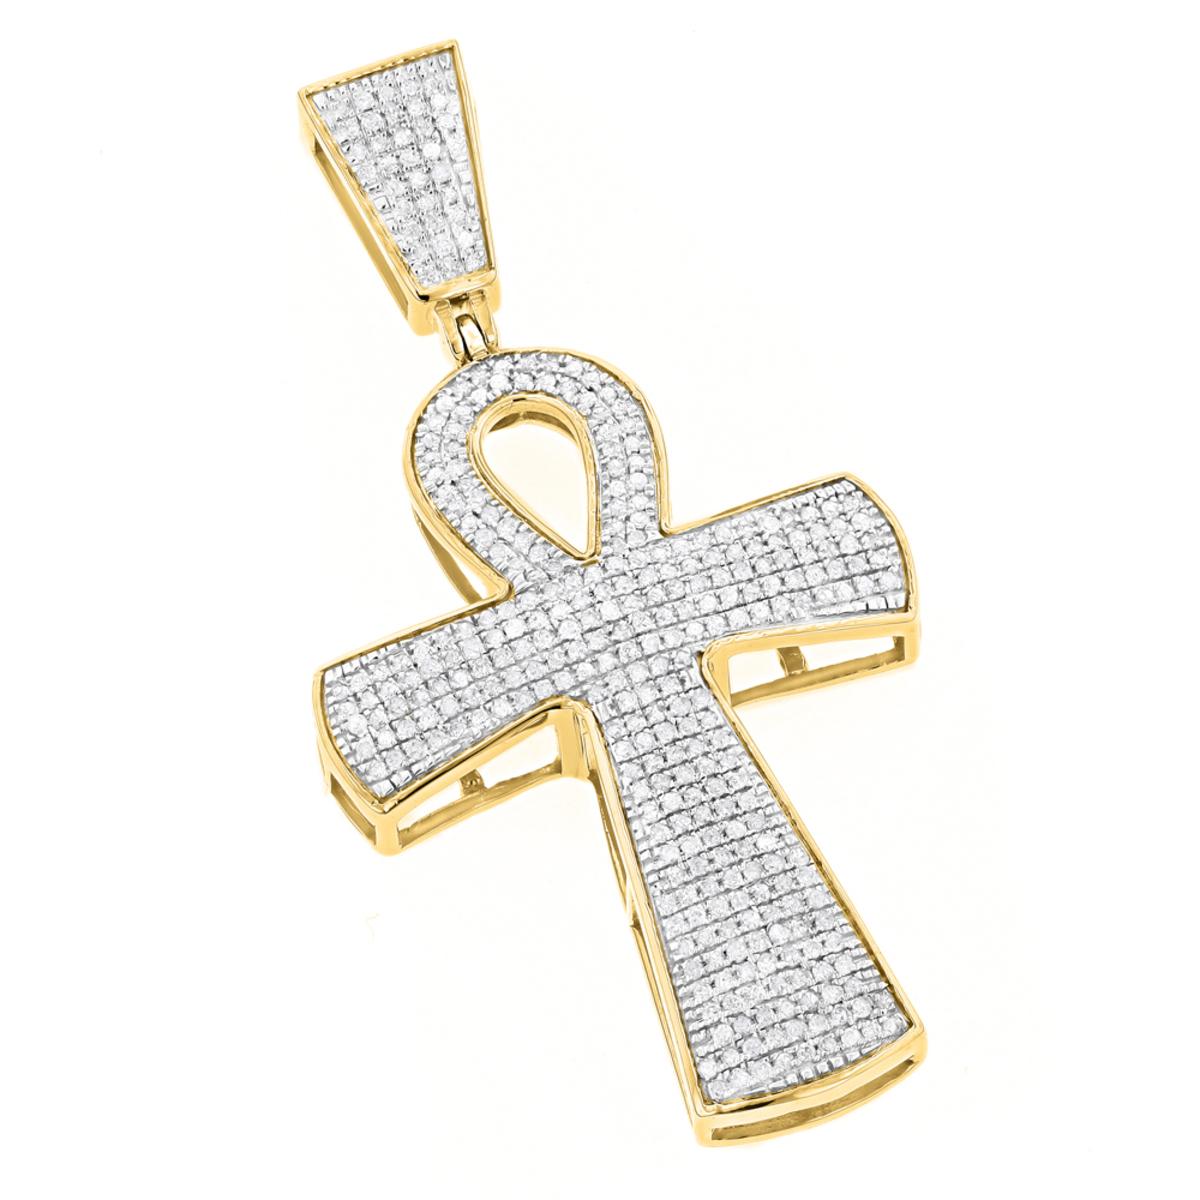 10K Gold Iced Out Egyptian Ankh Cross Diamond Symbol of Life Pendant 0.85ct